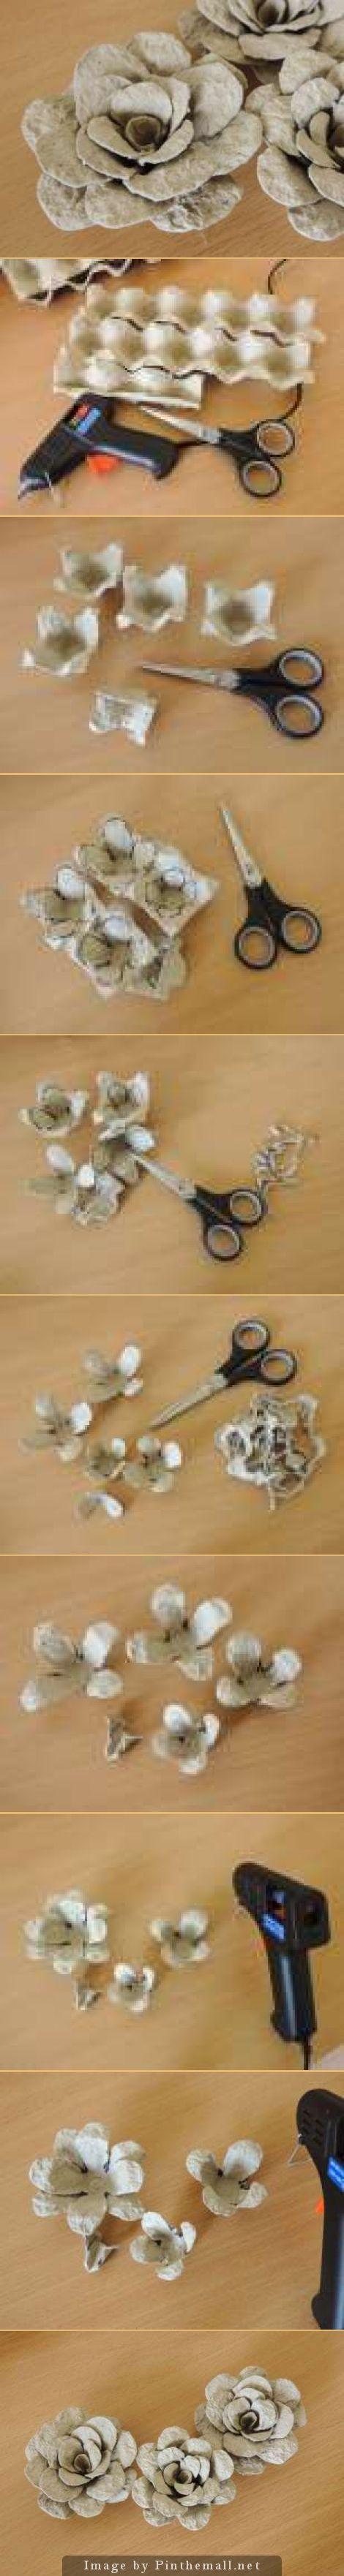 Rosenblüten Aus Eierkartons Leder Rüstung Pinterest